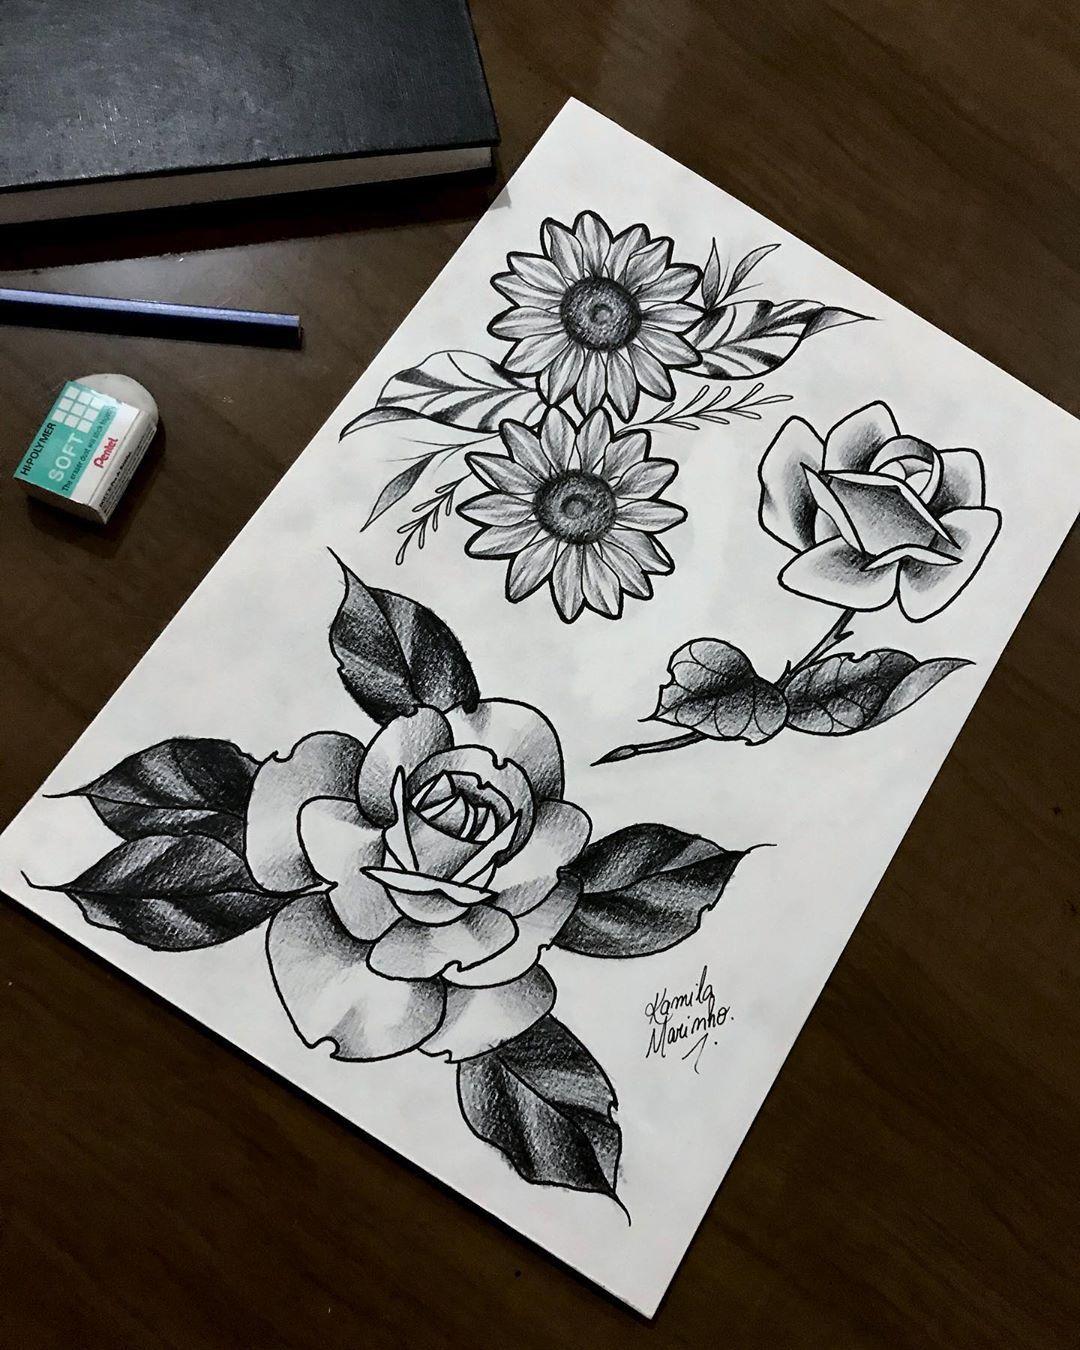 • DISPONÍVEIS •  Orçamentos e agendamentos por whatsapp(21 96669-4953) ou direct 💉🎨 #tattoo #tattooed #tattooer #tattooing #tattoo2me #tattooart #tattooink #blackwork #blackworktattoo #tattootime #tattoodesign #drawing #drawingtattoo #drawingart #tattoorj #tatuagem #drawingink  #inspiration #tattooinspiration